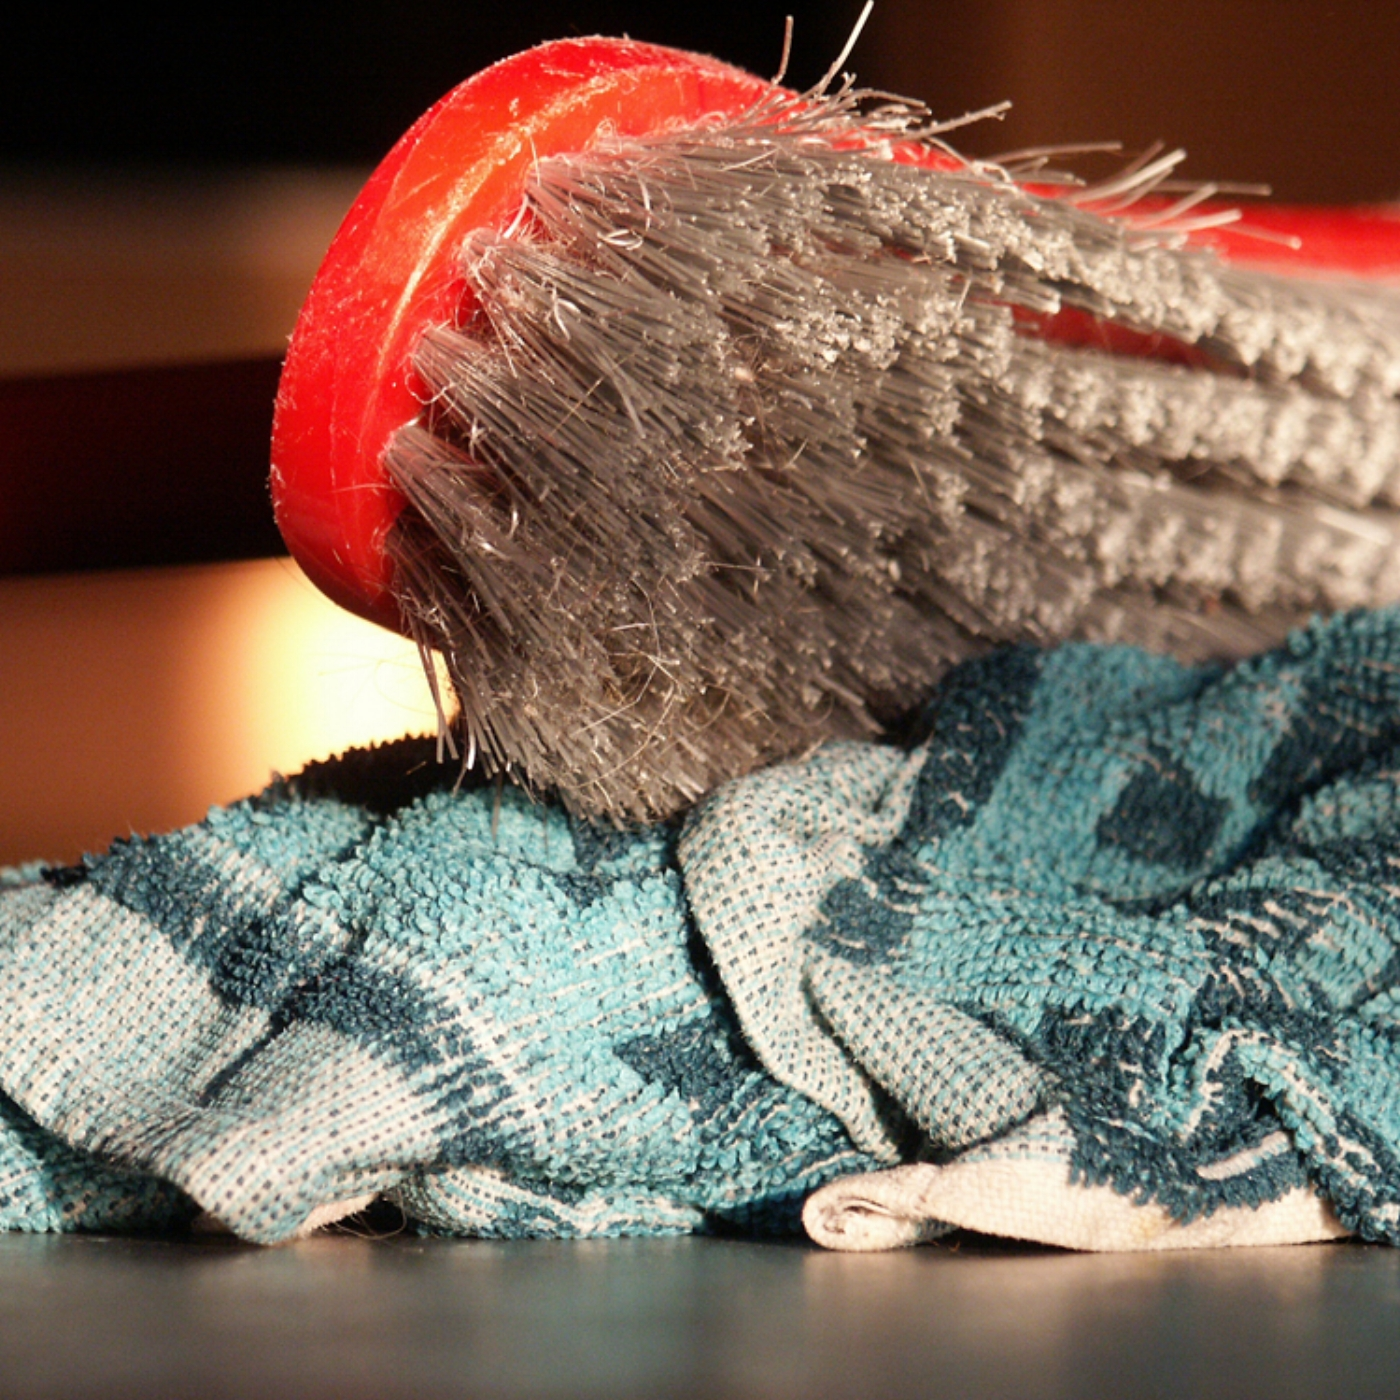 CleaningFloors_OzburnHessey.jpg